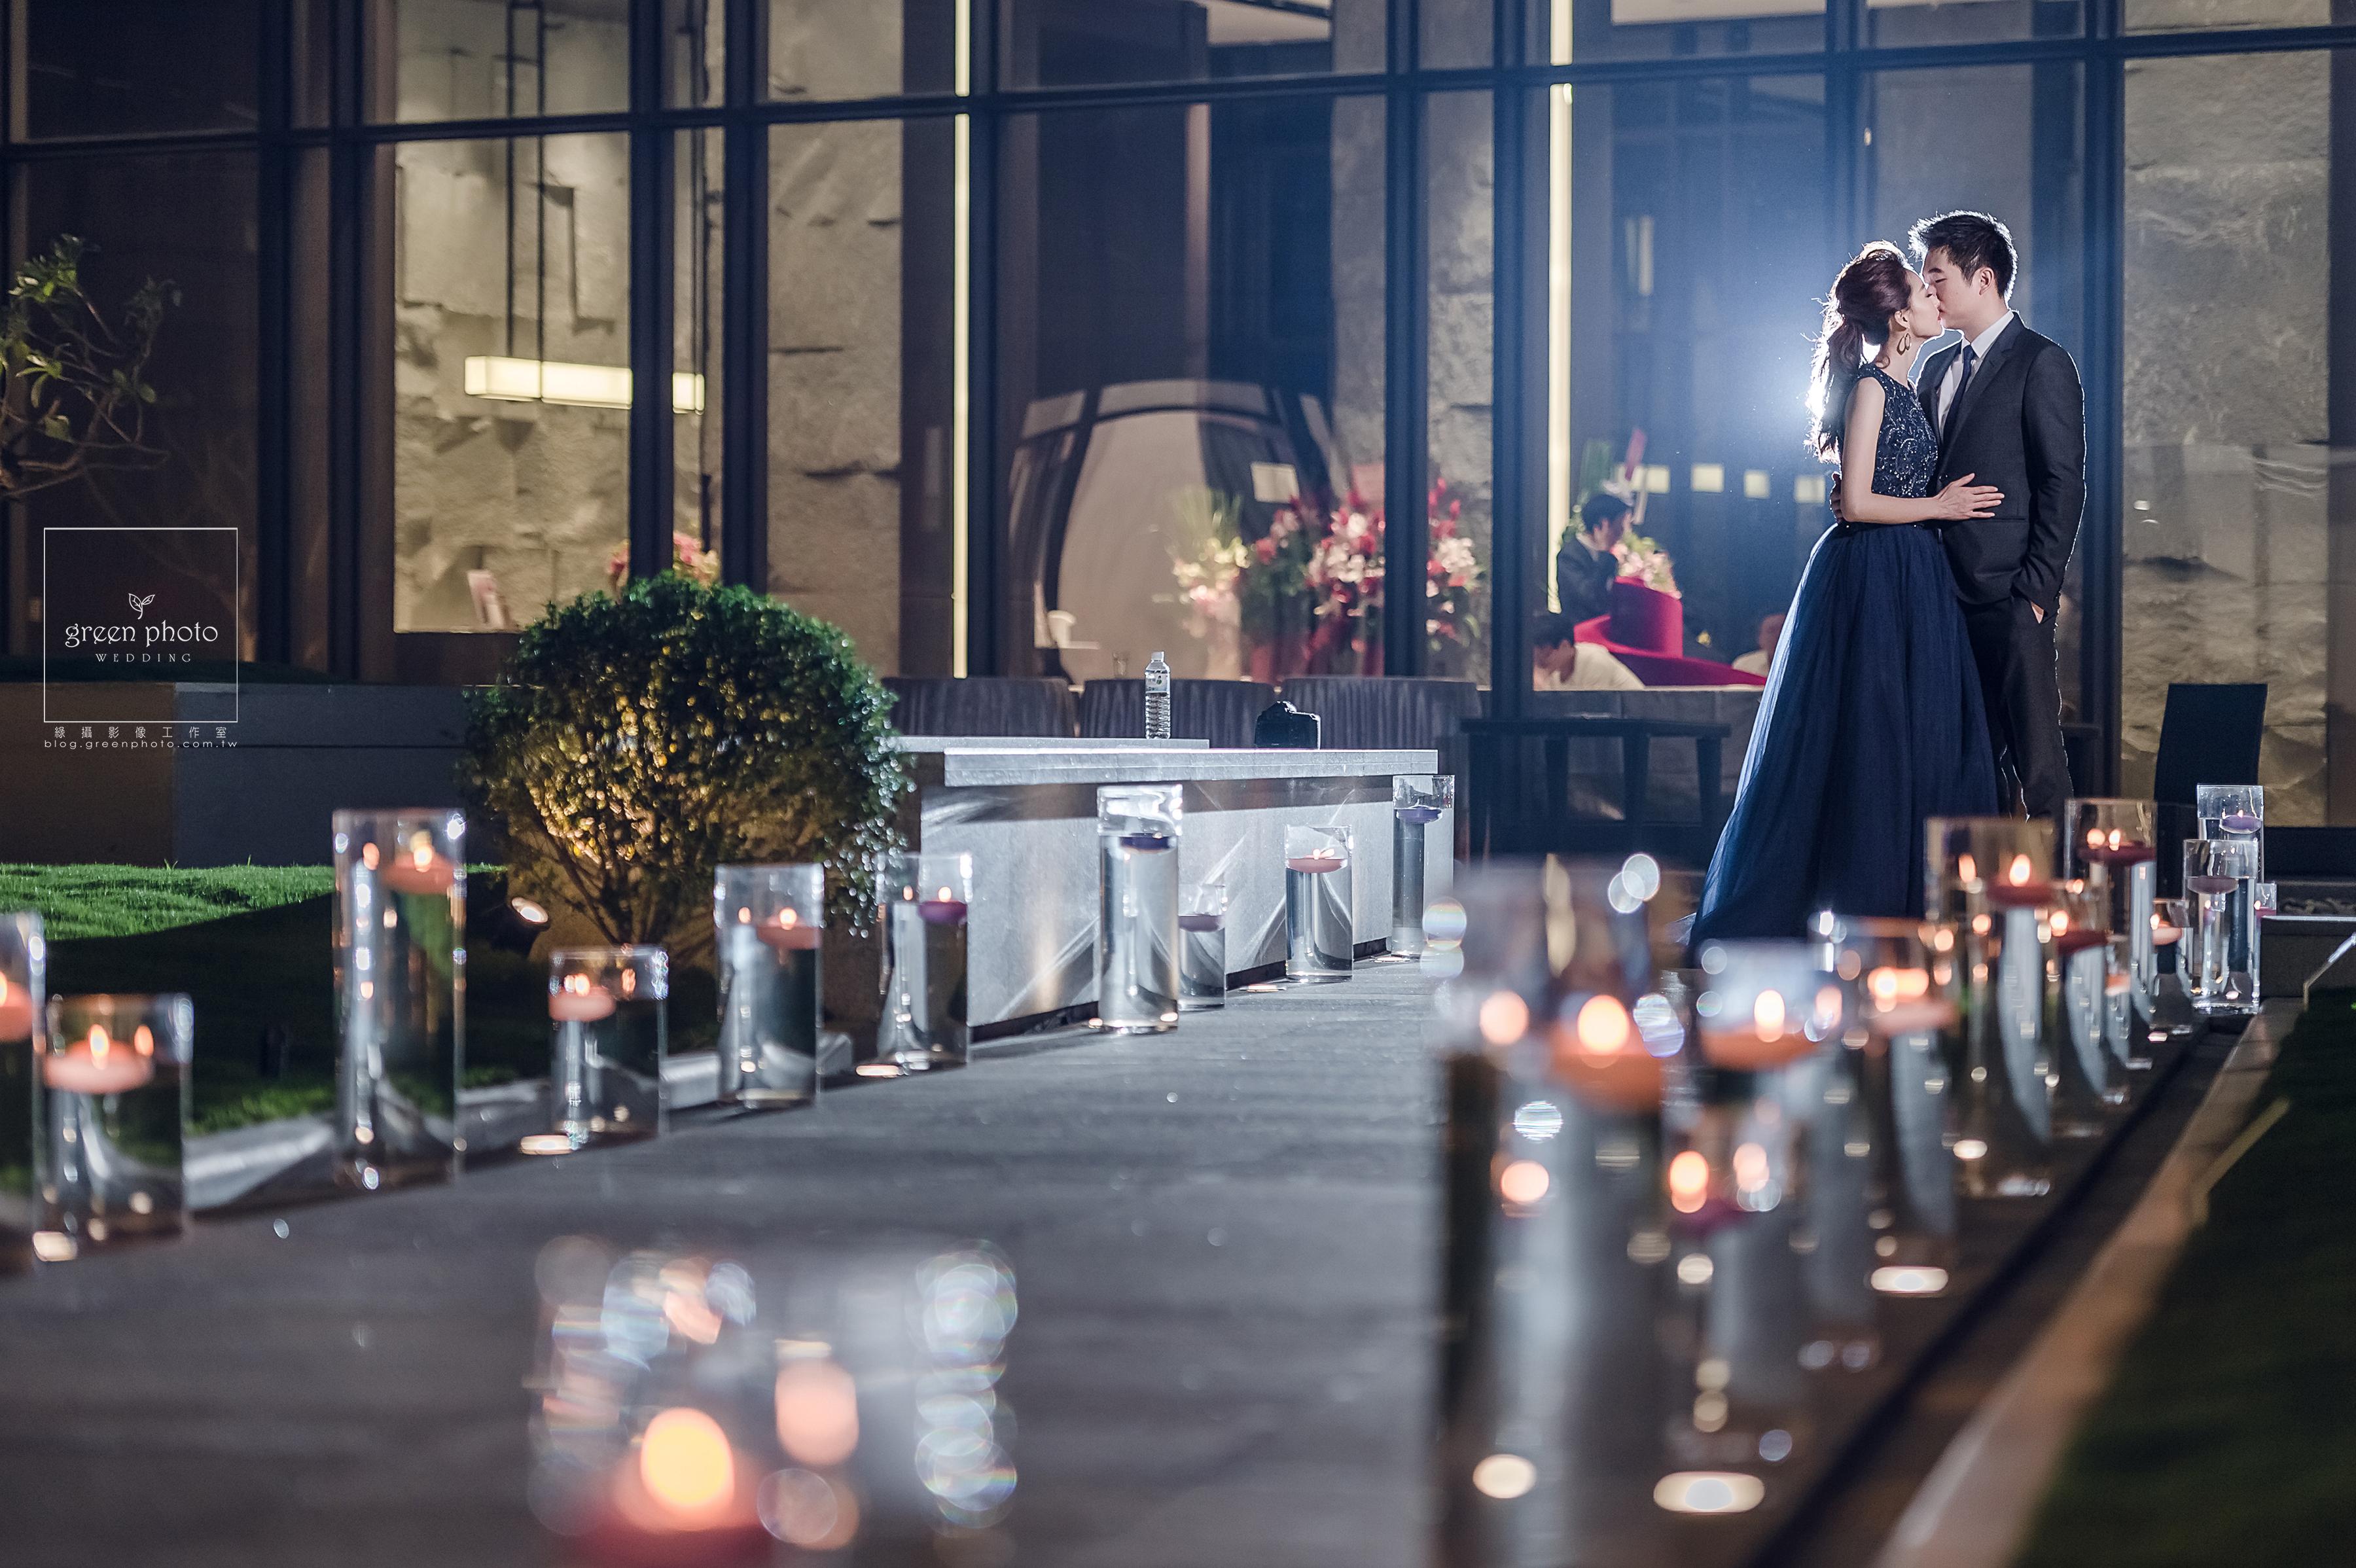 Catherine Makeup Studio,綠攝影像,武少,阿三,黑熊,白金花園酒店,新店,婚禮紀實,婚禮紀錄,雙主攝,